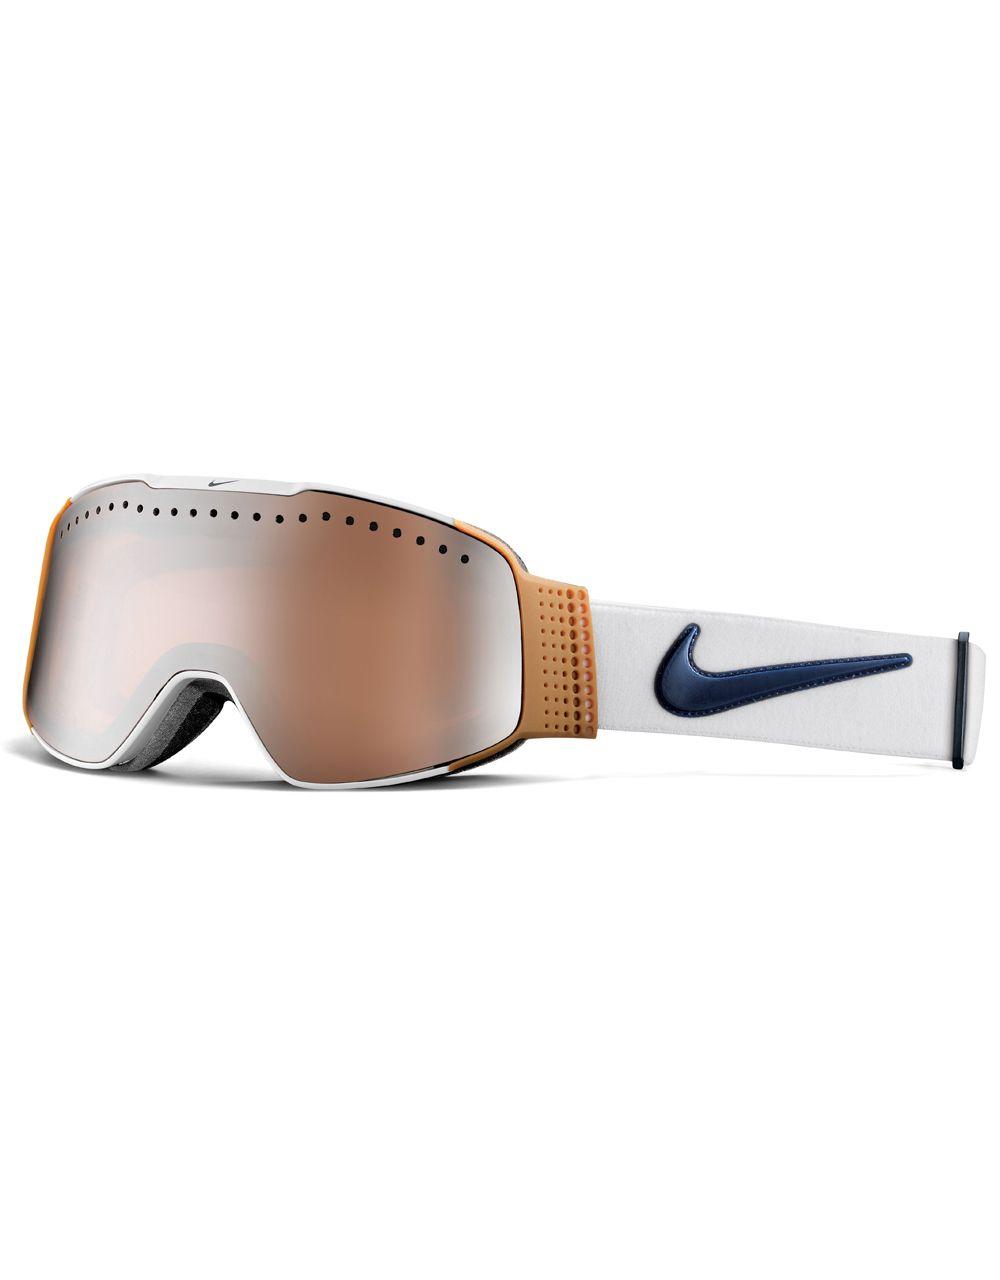 a8a37d8e83c9 ... Nike SB Fade 2016 Snowboard Goggles - WhiteGumObsidian - Silver Ion   Nike SB snow goggle MAZOT University RED WHITE BLACK ...